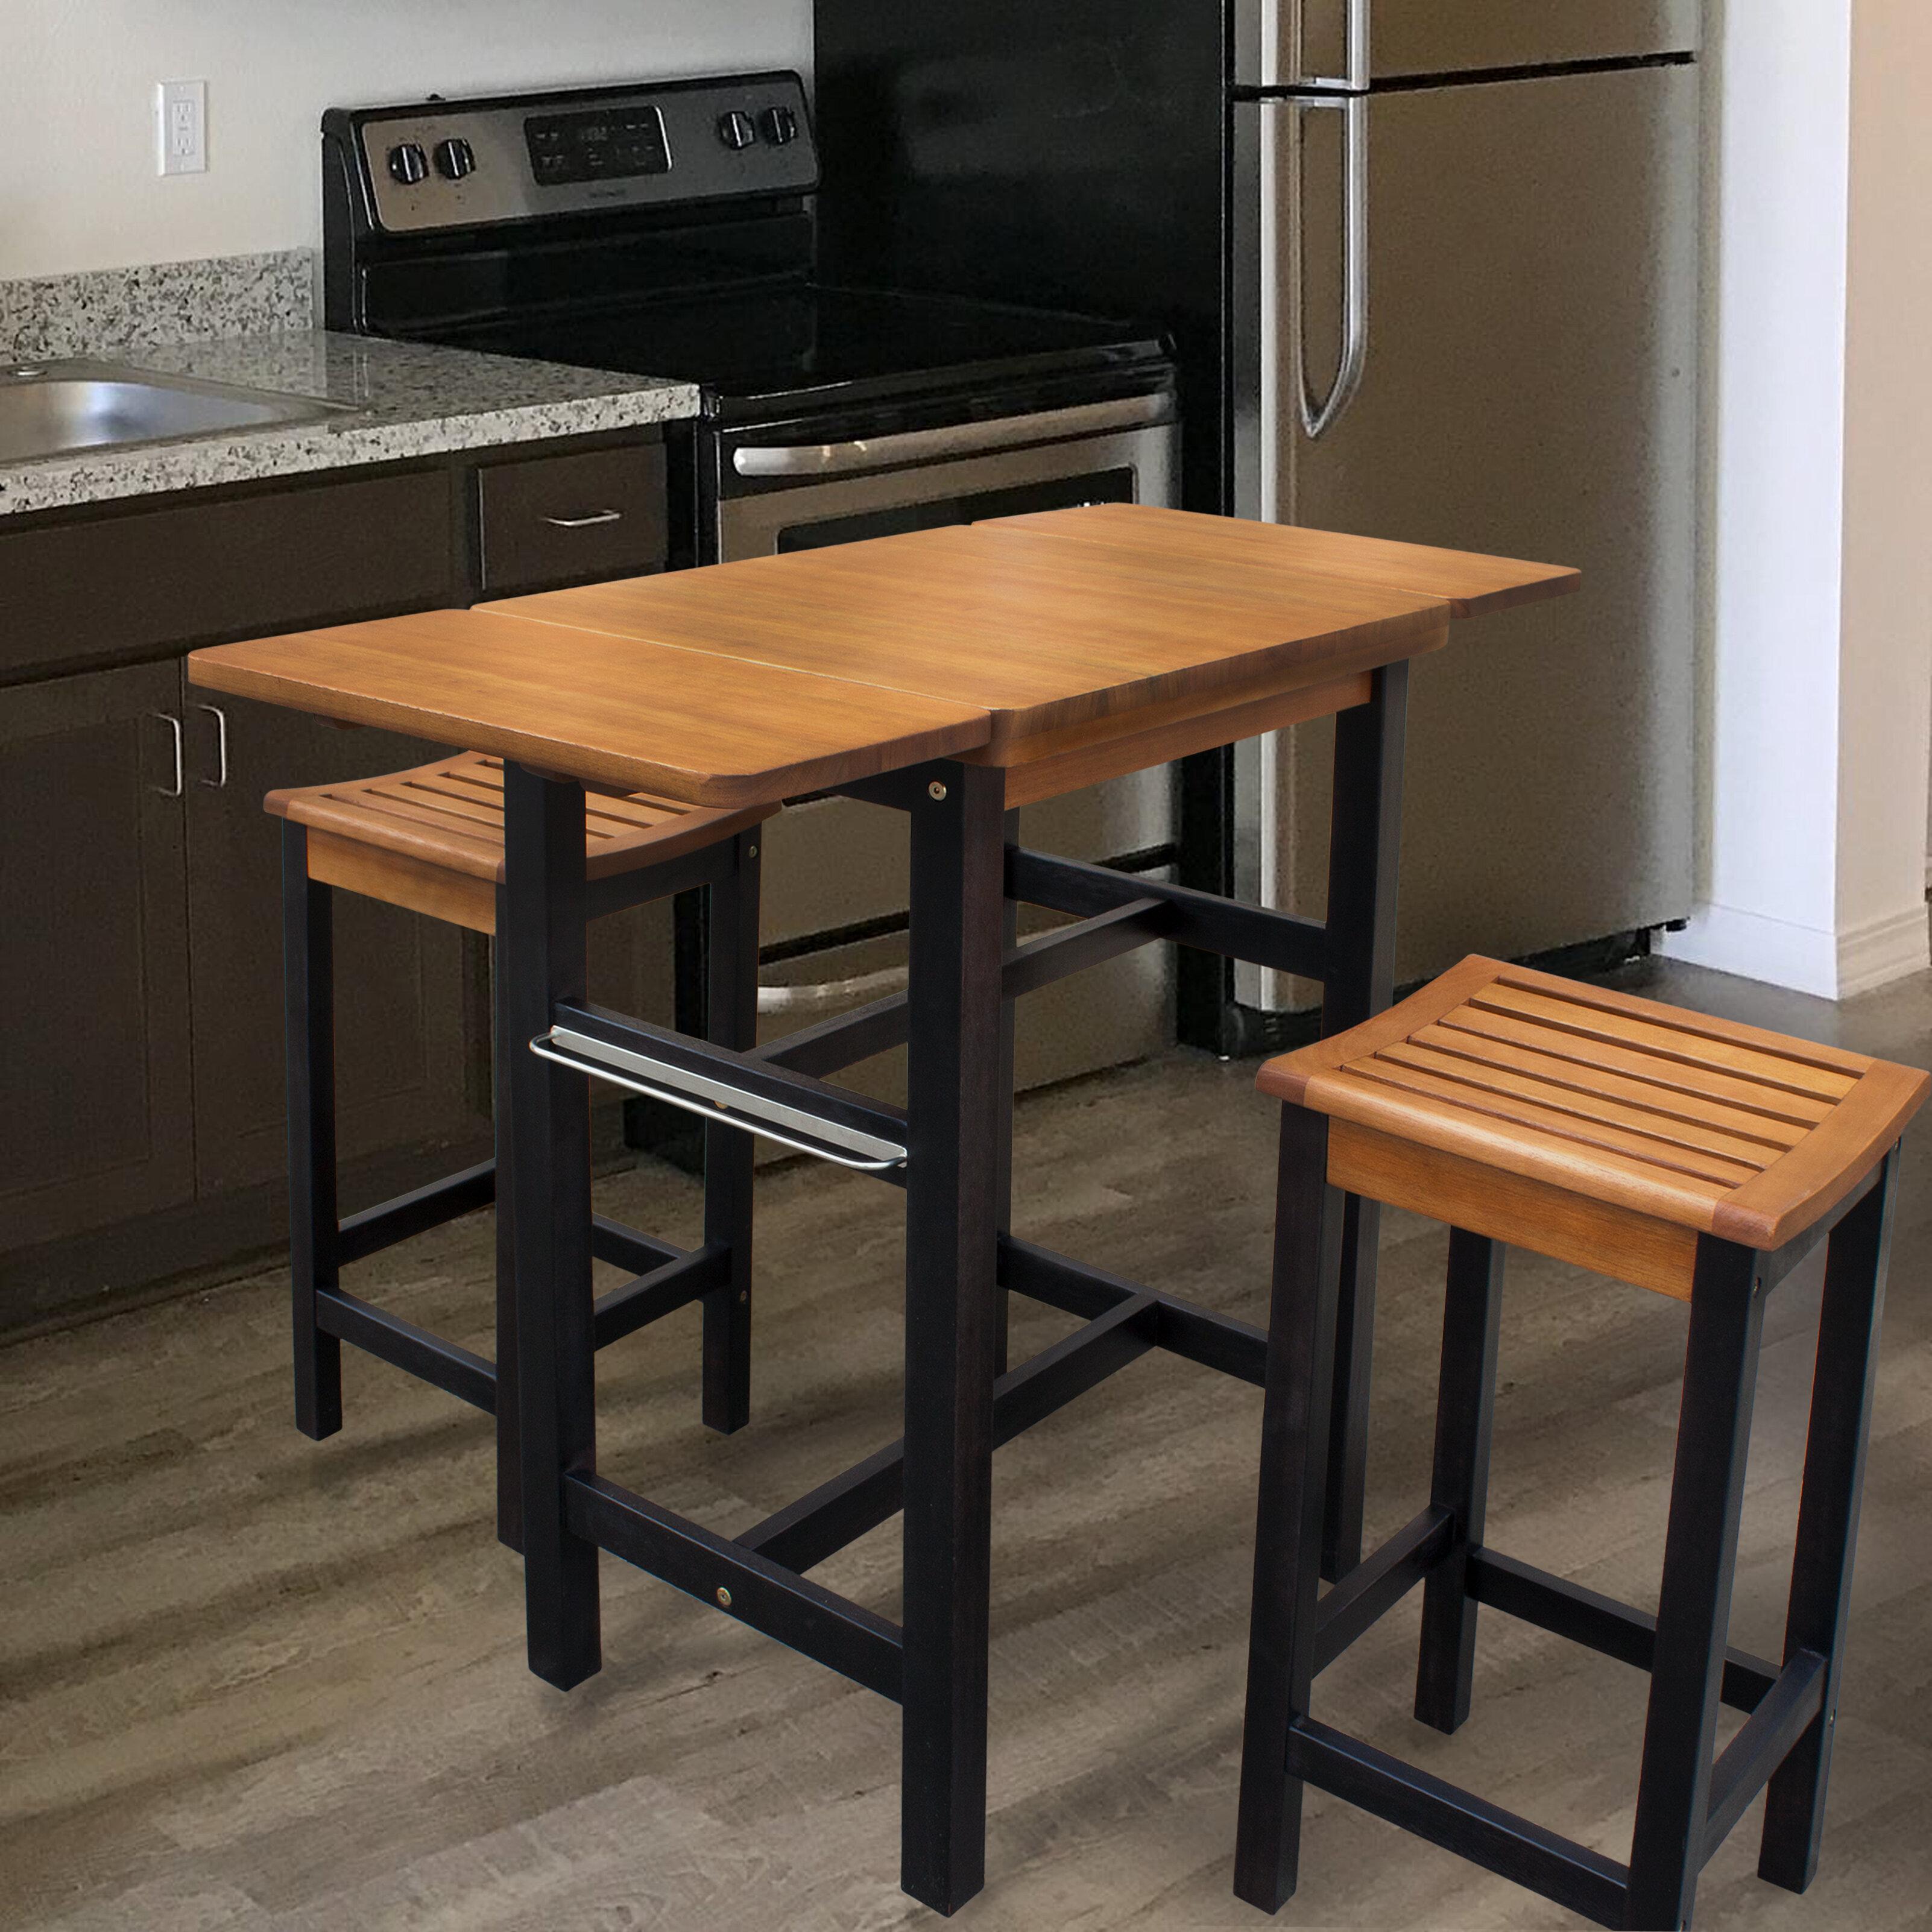 Red Barrel Studio Jeanetta 3 Piece Table Stool Kitchen Island Set Reviews Wayfair